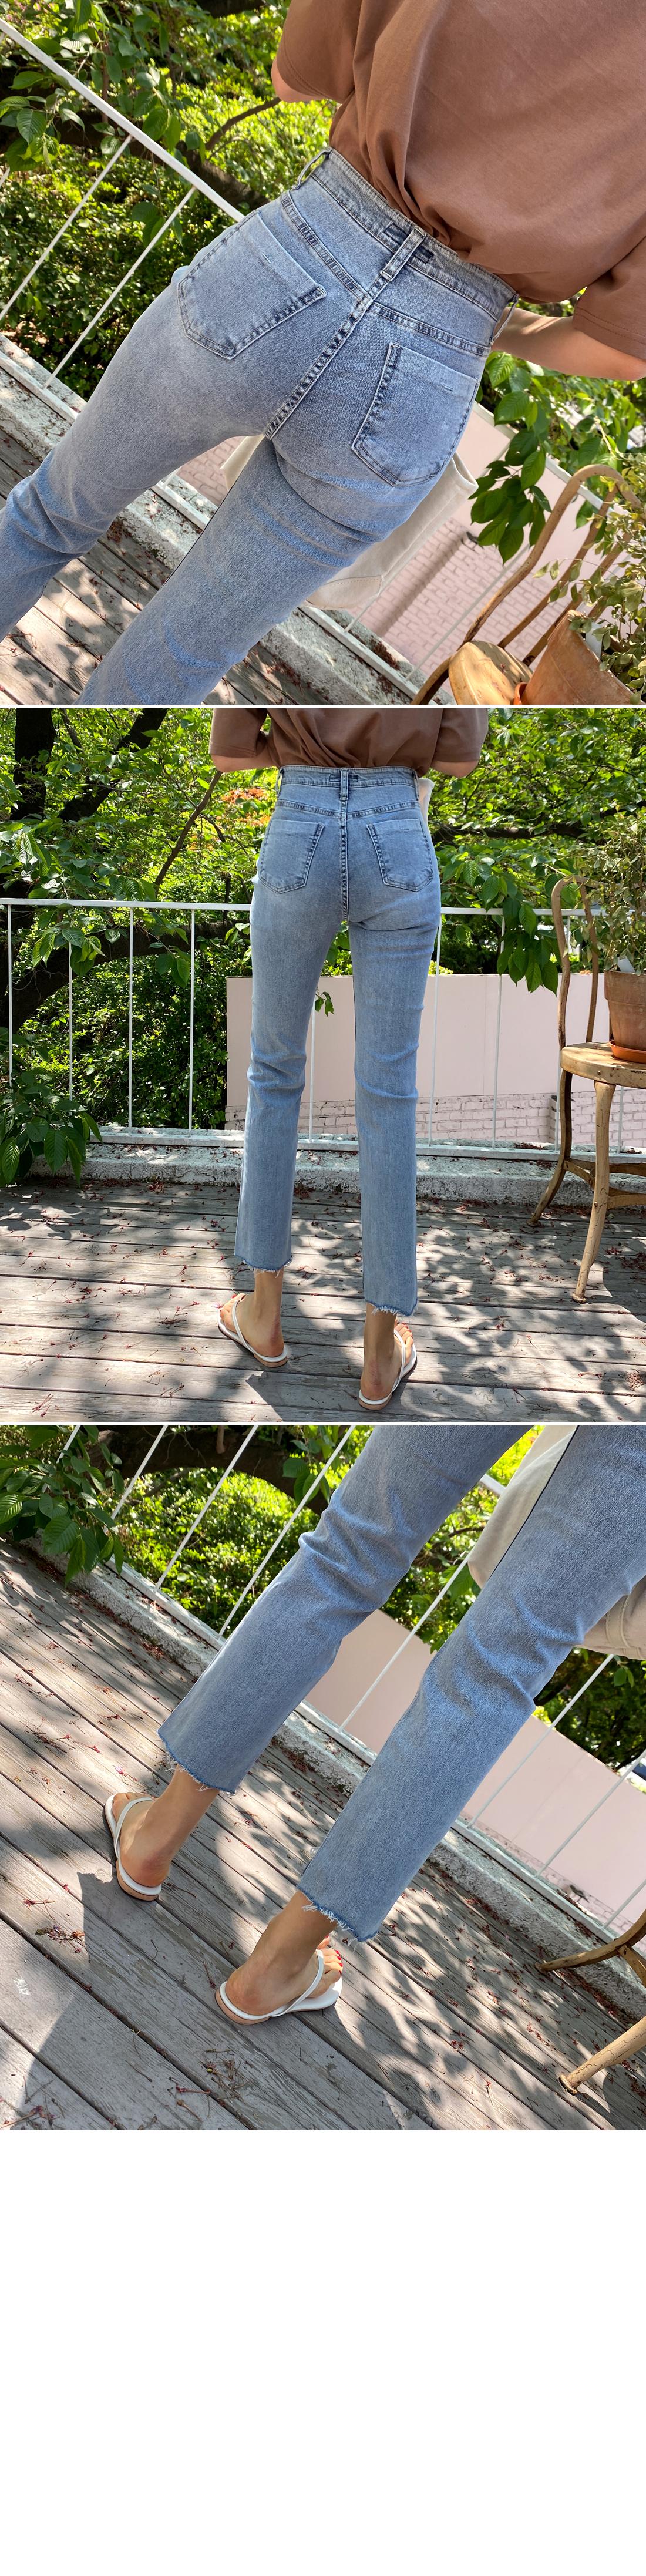 Week hem square-cut slim date jeans